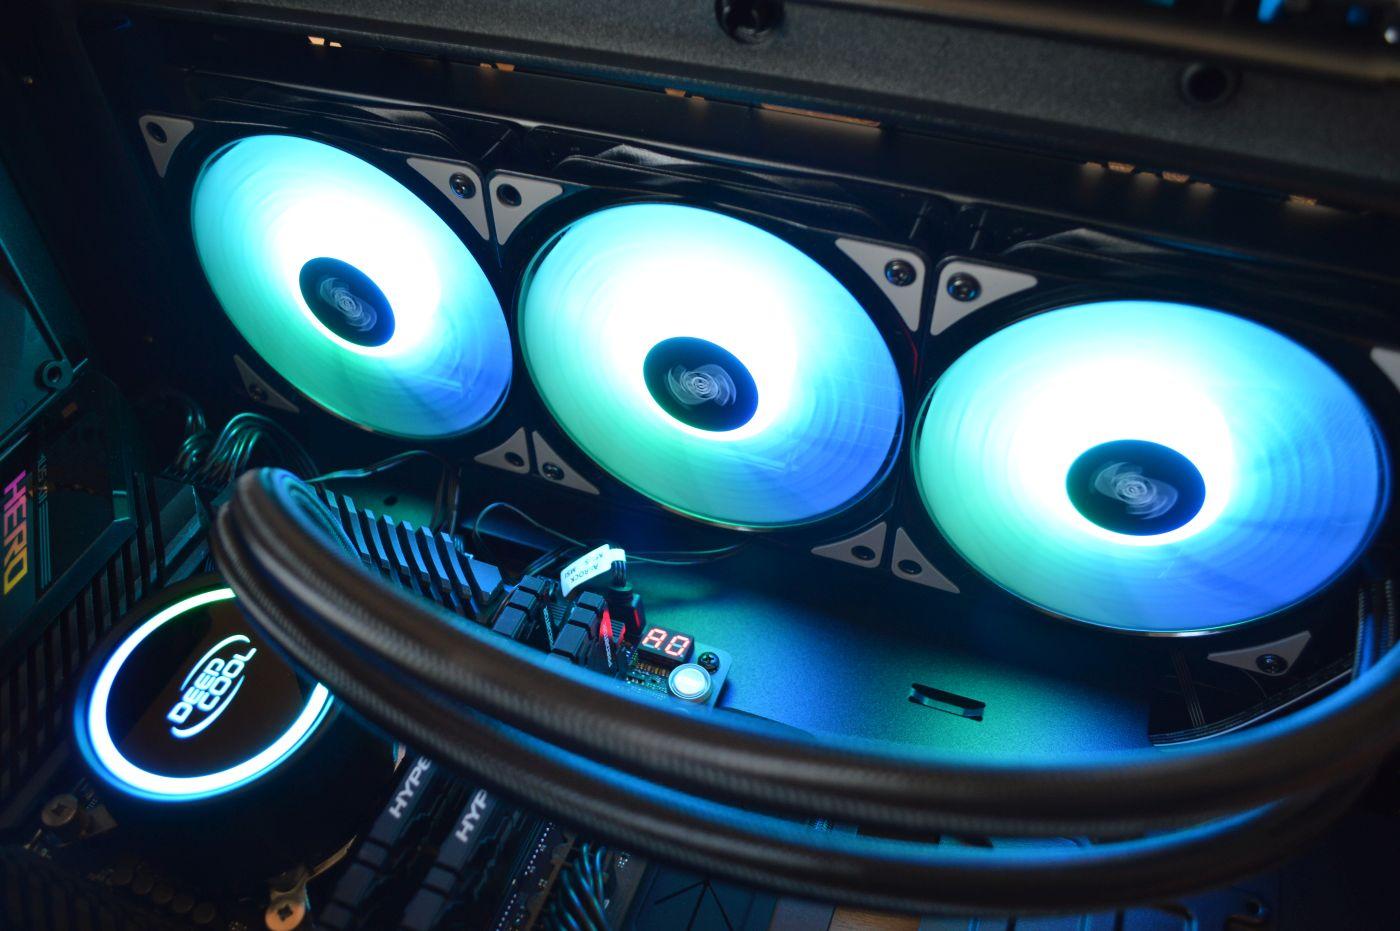 радиатор Deepcool Gammaxx L360 A-RGB